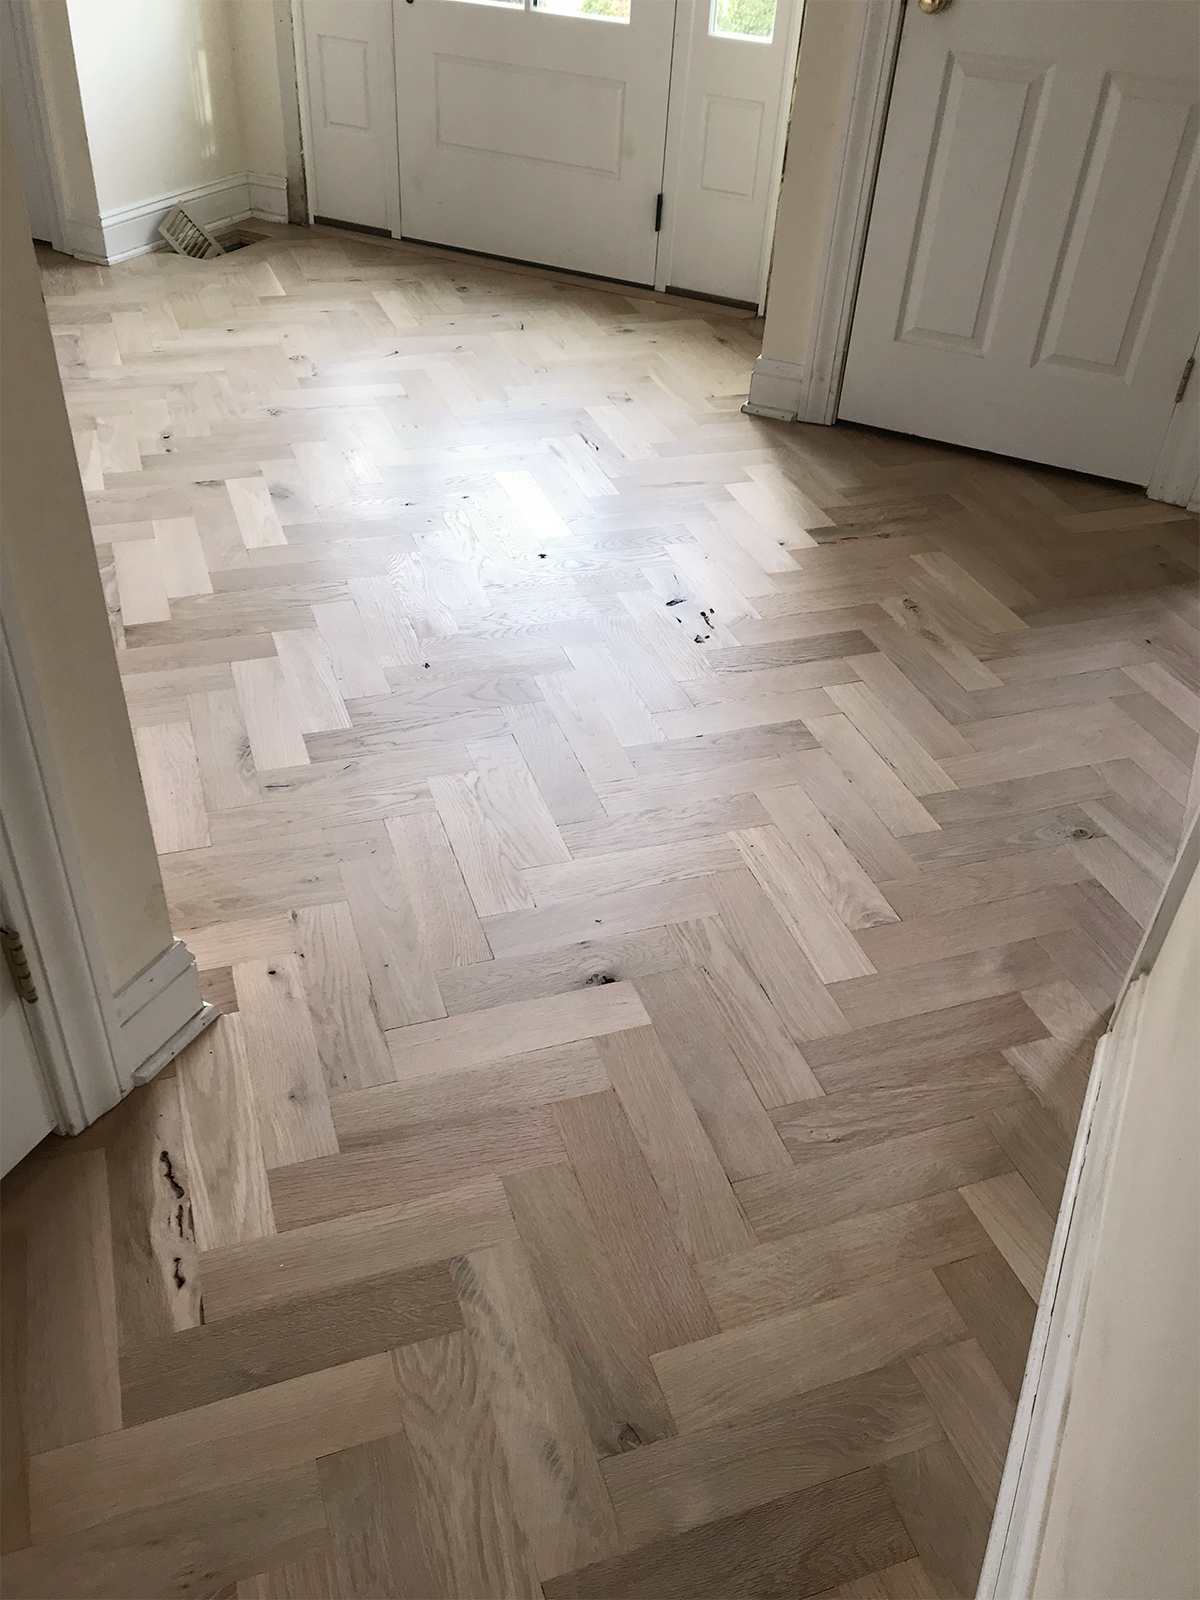 Entryway Renovation Update: Floors | root + dwell